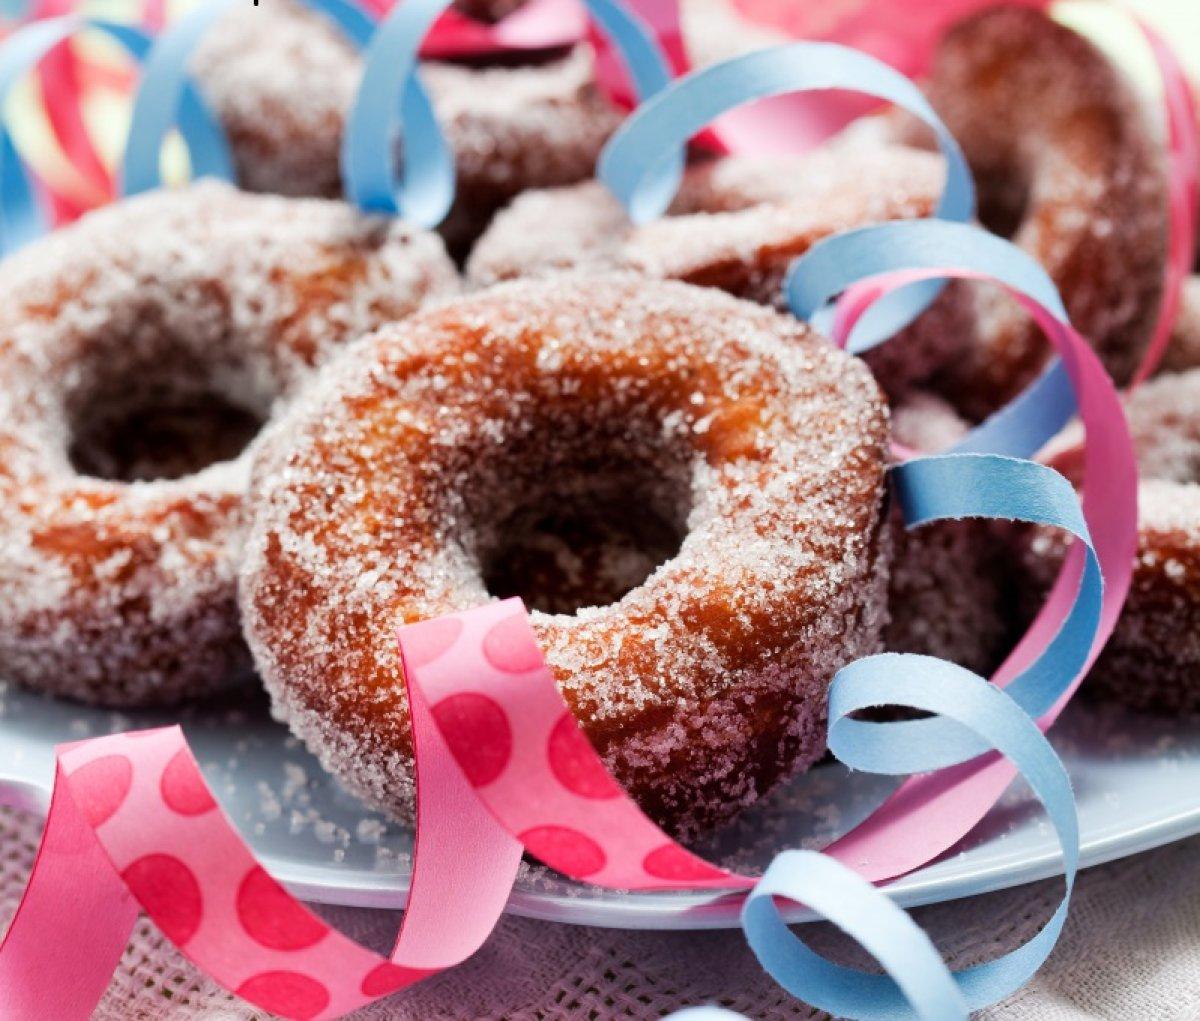 Sugar-donuts-photo mostphotos